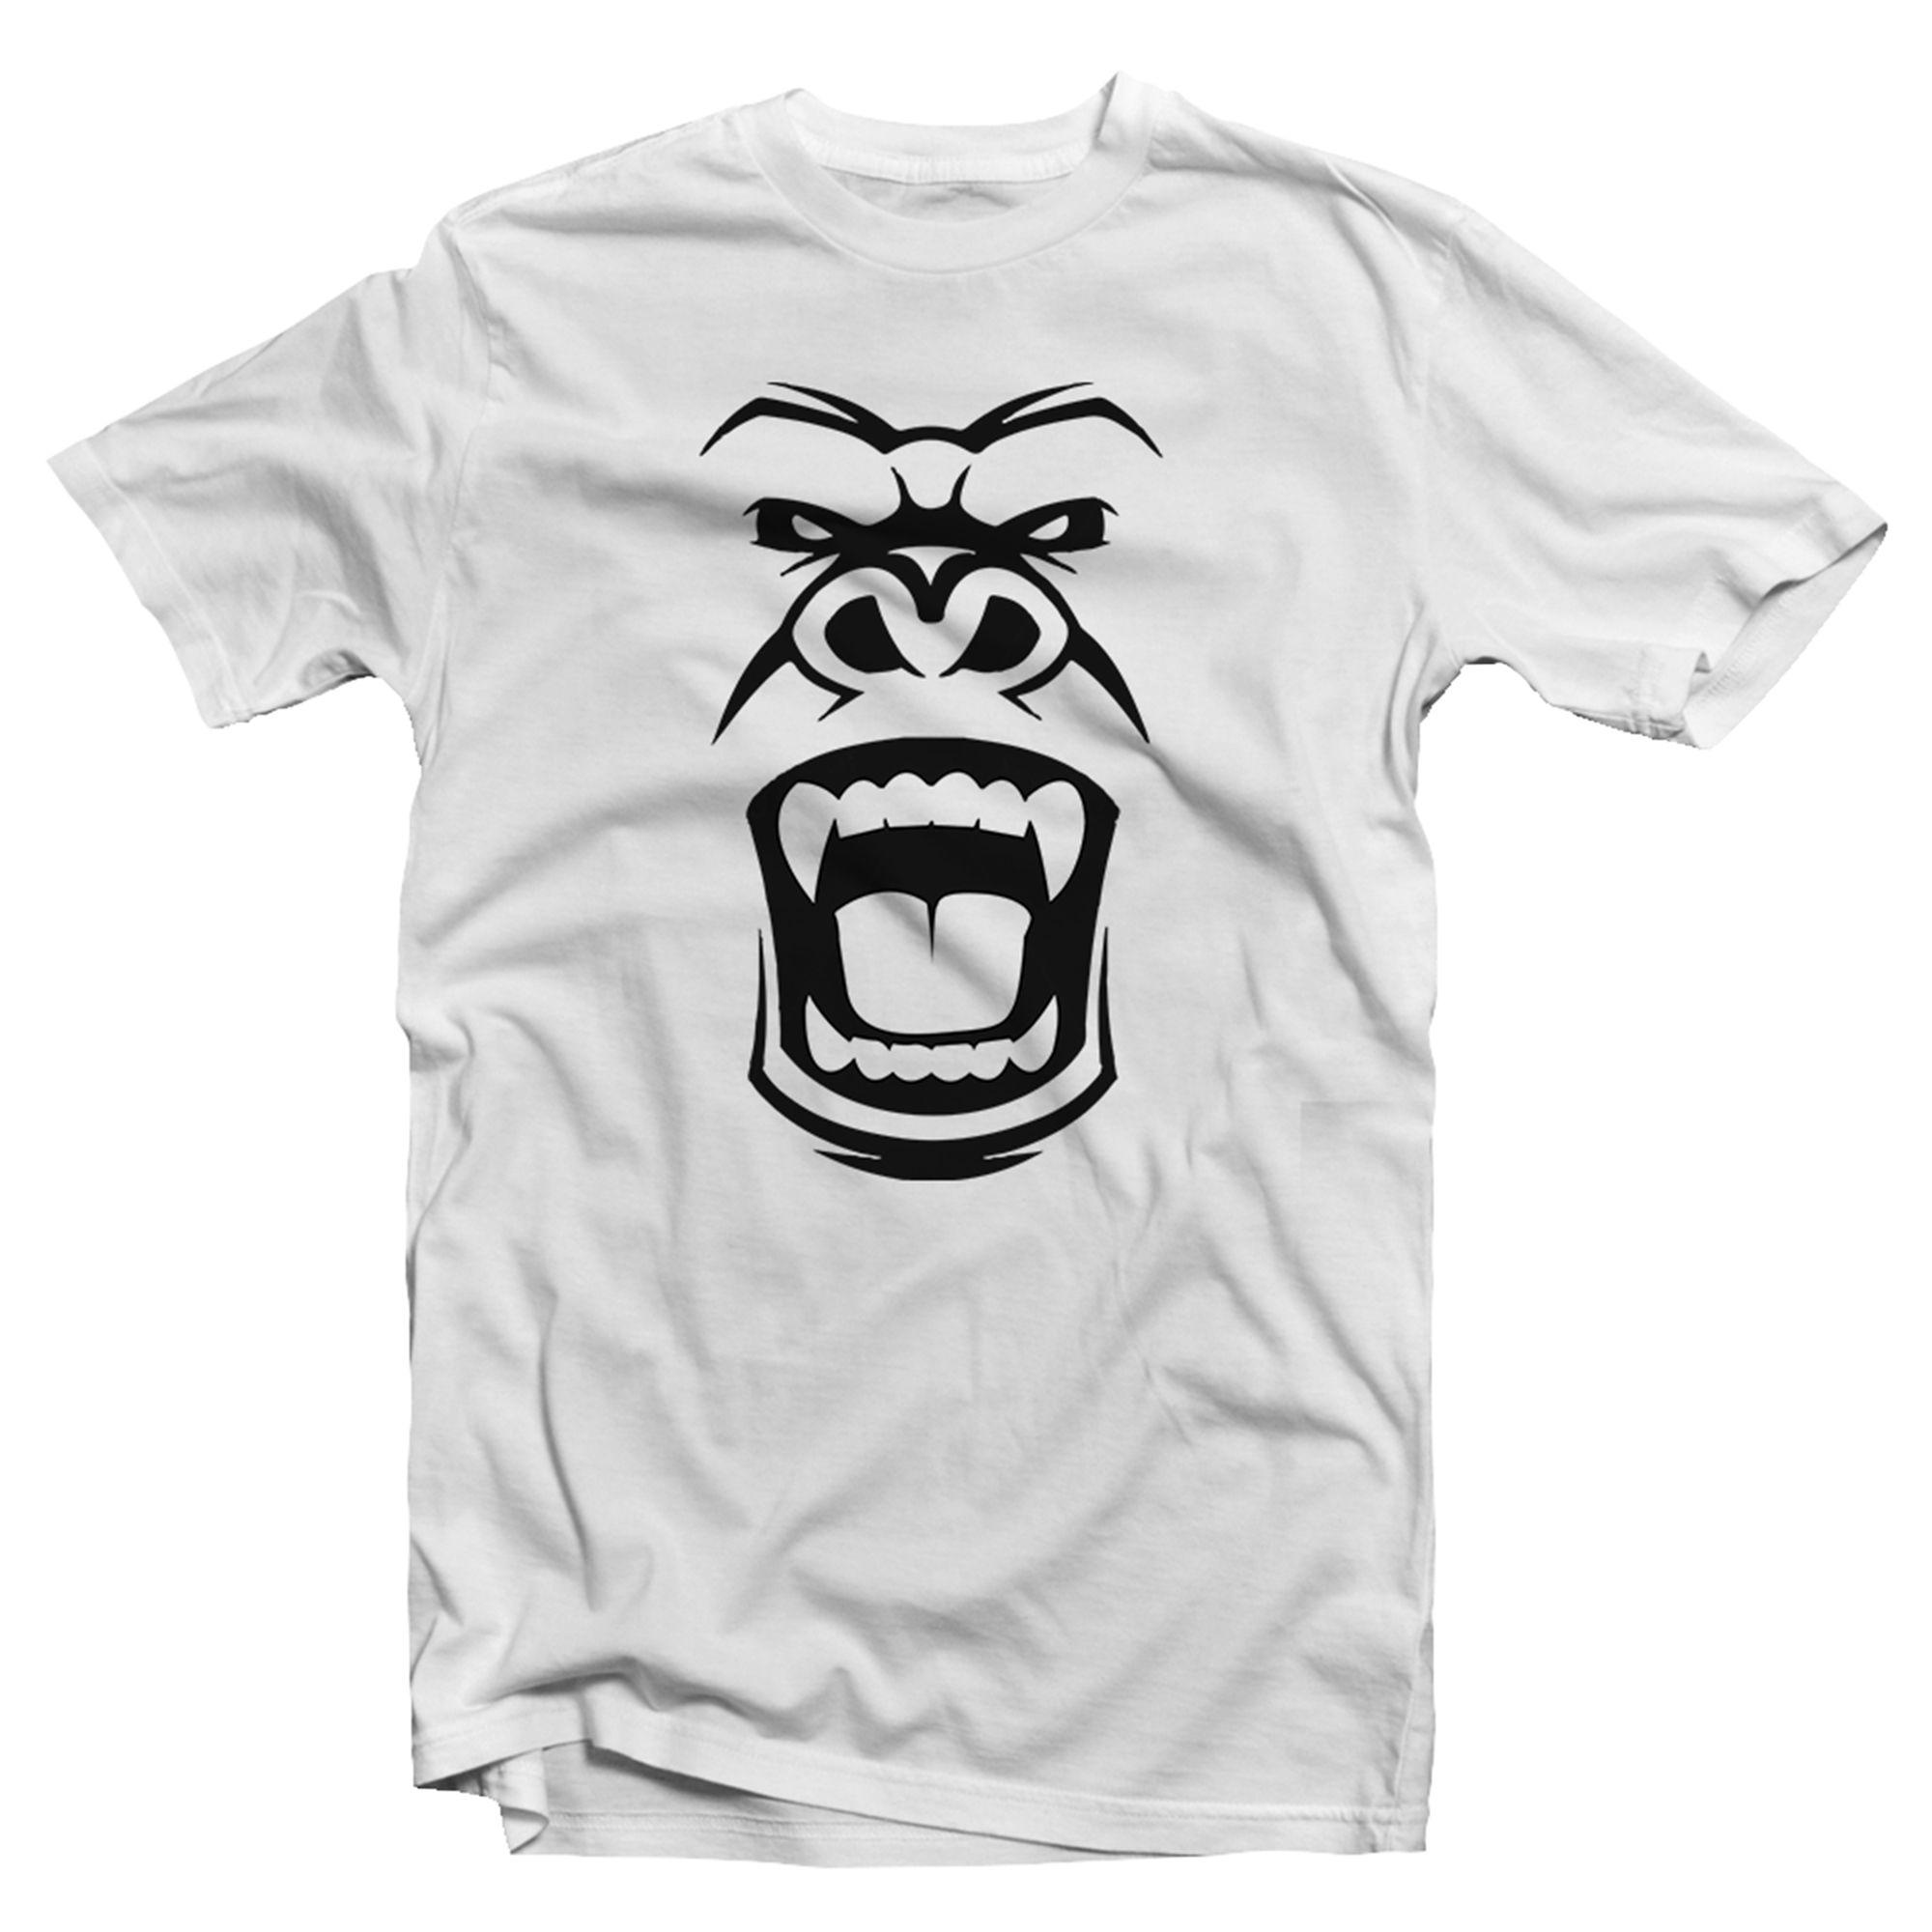 Kids Plain T-Shirts Boys Tops /& Shirt Angry Gorilla